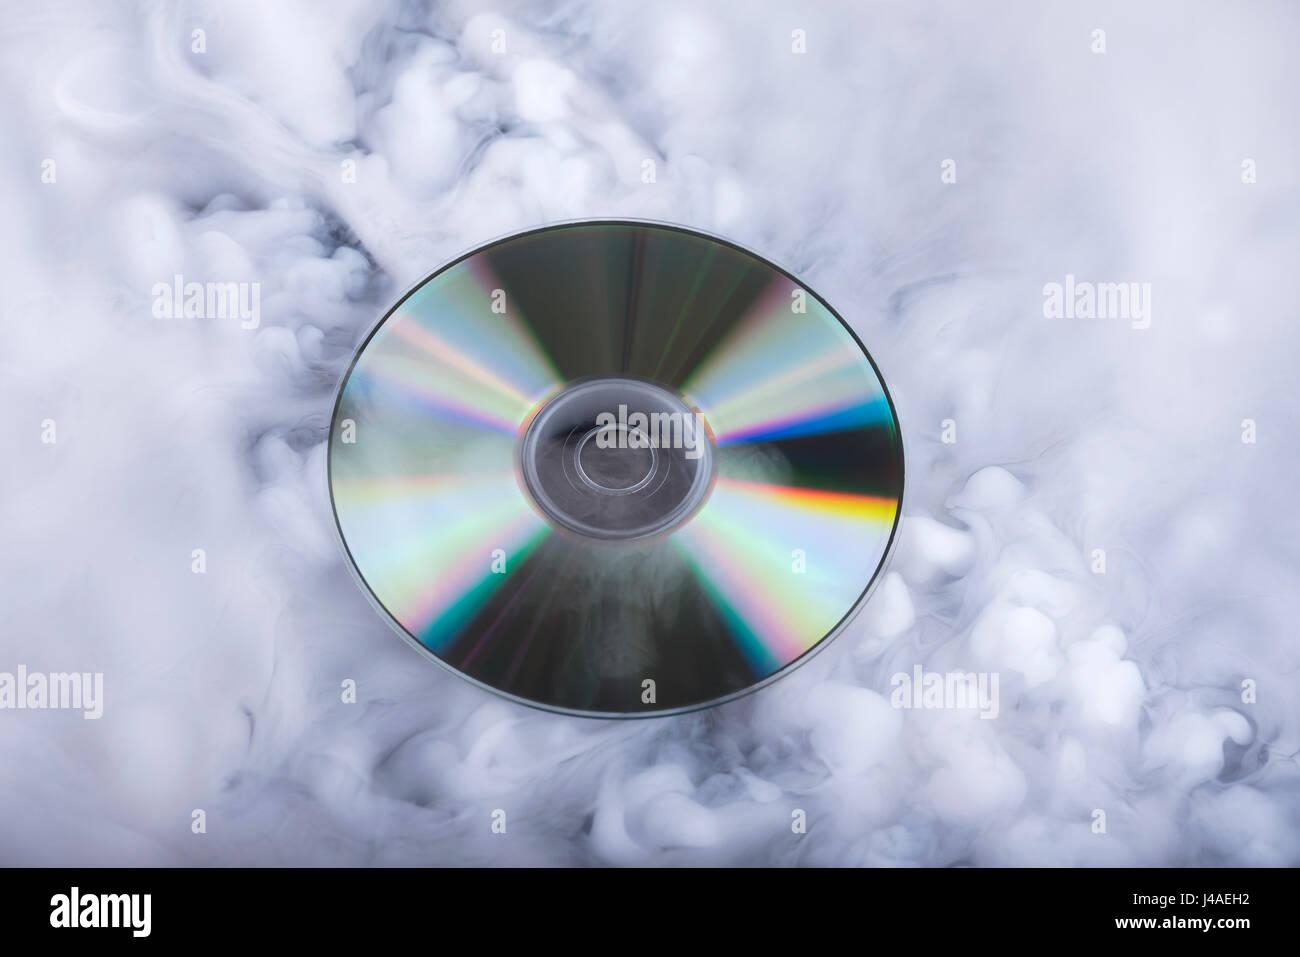 Compact disk  Soundcloud  Conceptual image Stock Photo